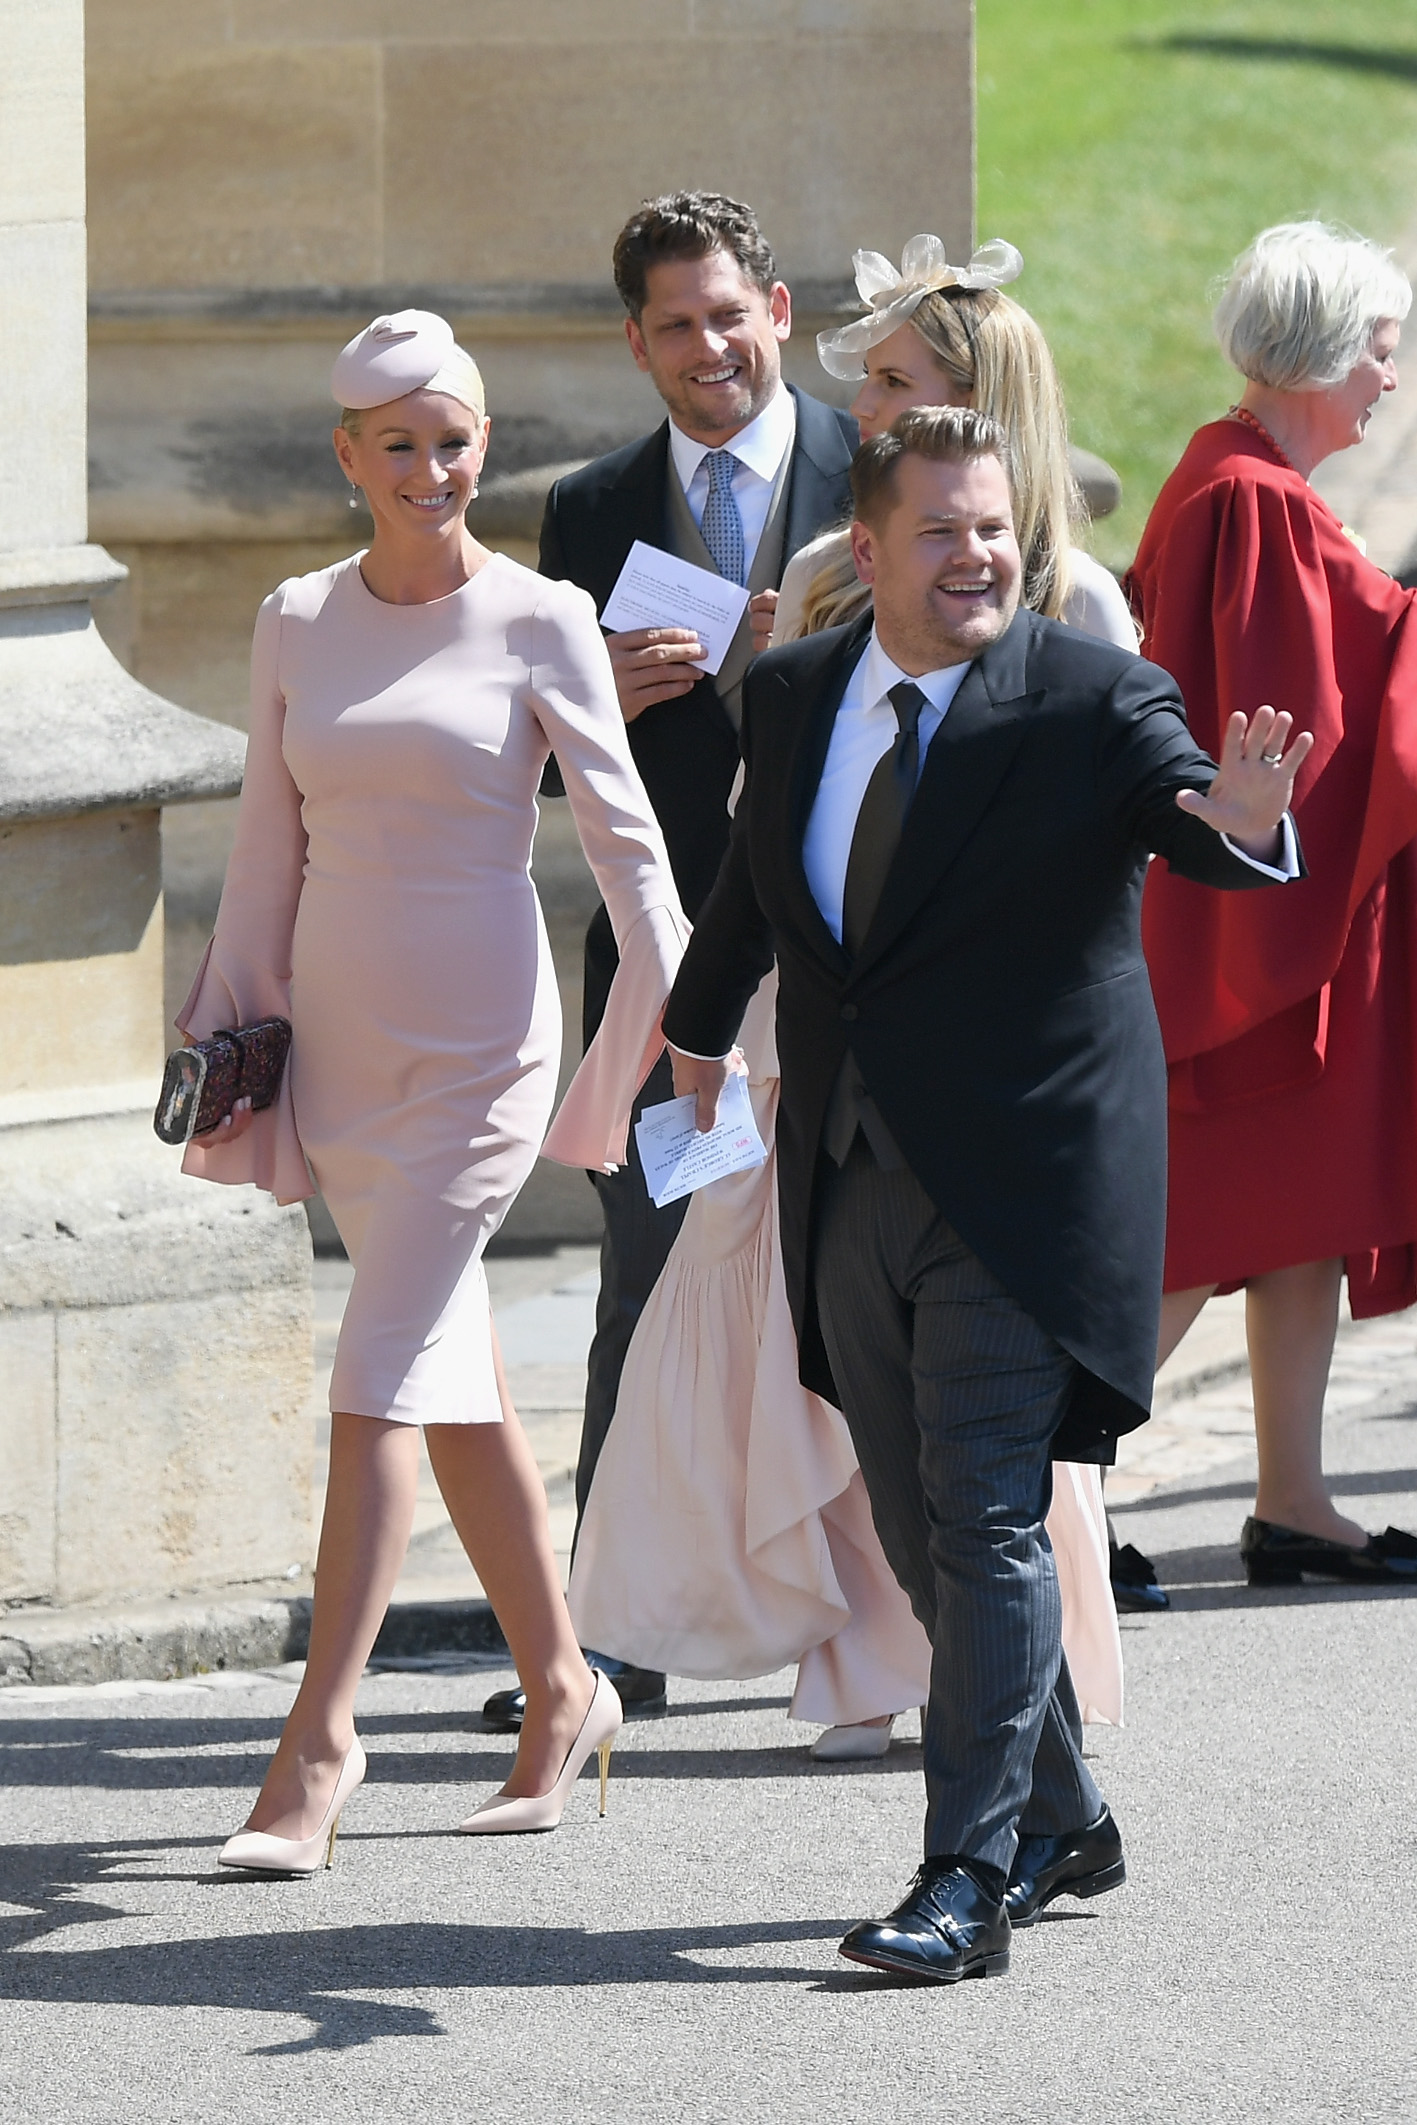 Royal Wedding 2018 Guests.Royal Wedding 2018 The Famous Guests Martha Stewart Weddings